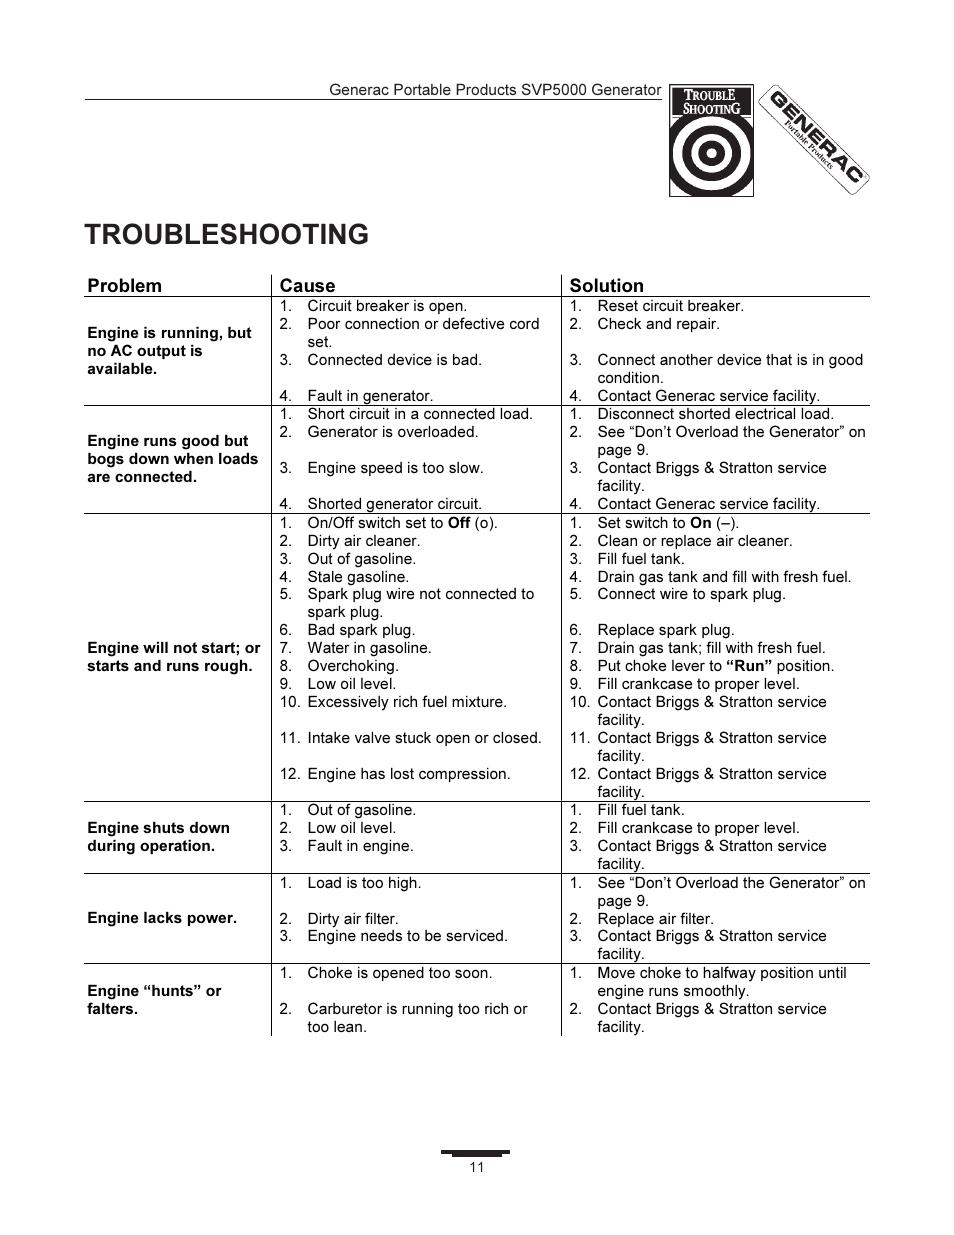 Troubleshooting | Generac SVP5000 97193 User Manual | Page